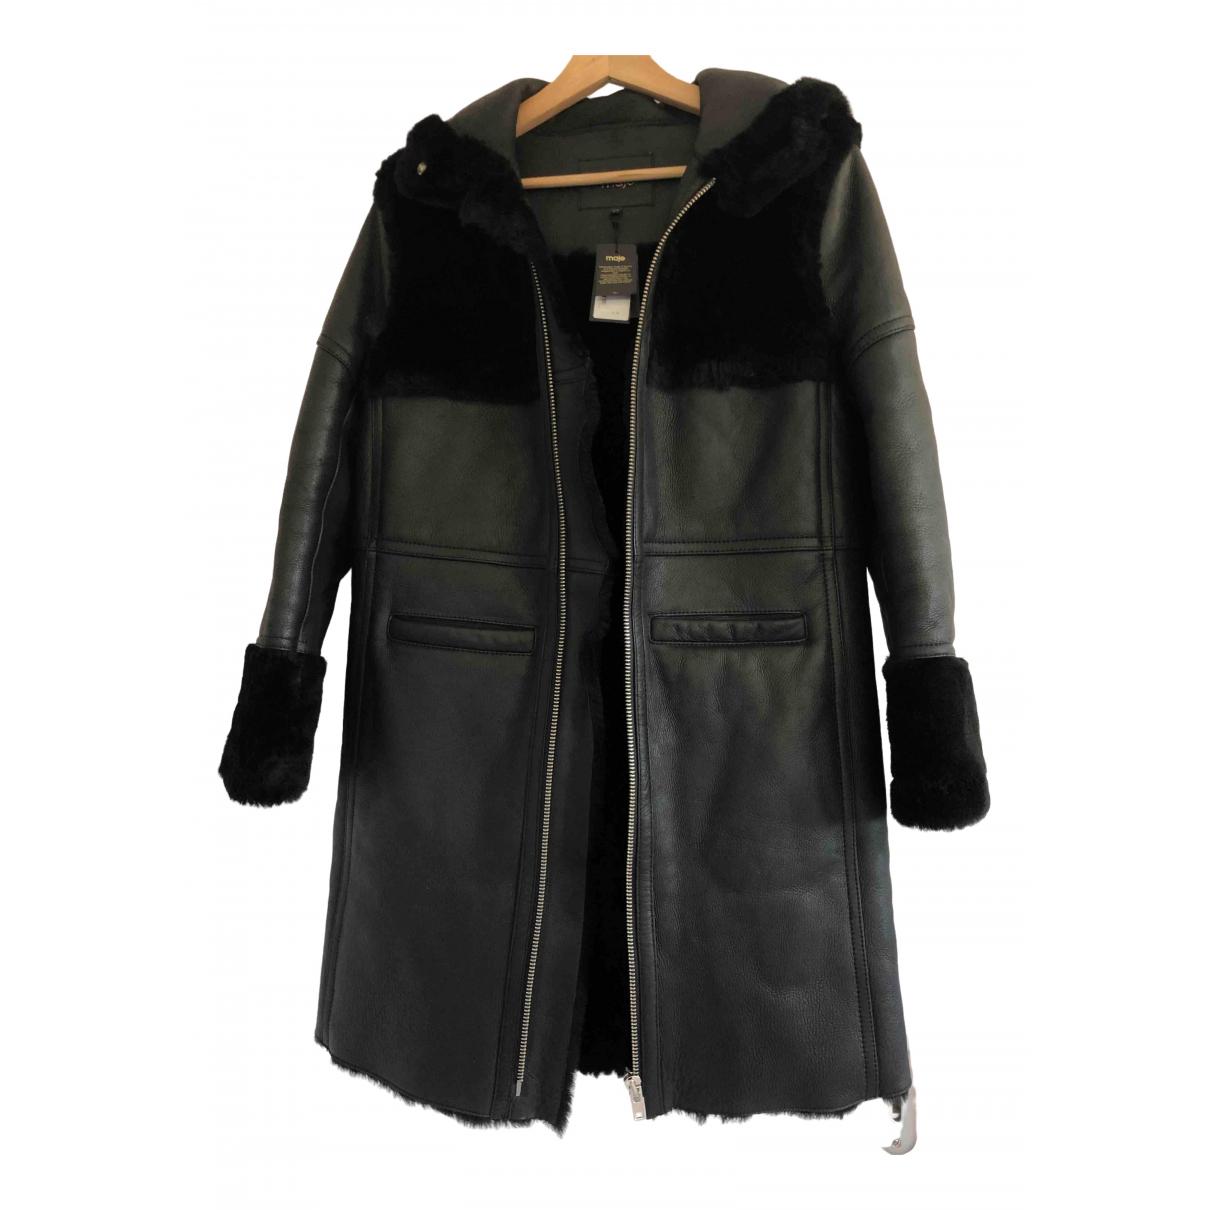 Maje Fall Winter 2019 Black Mongolian Lamb coat for Women 36 FR